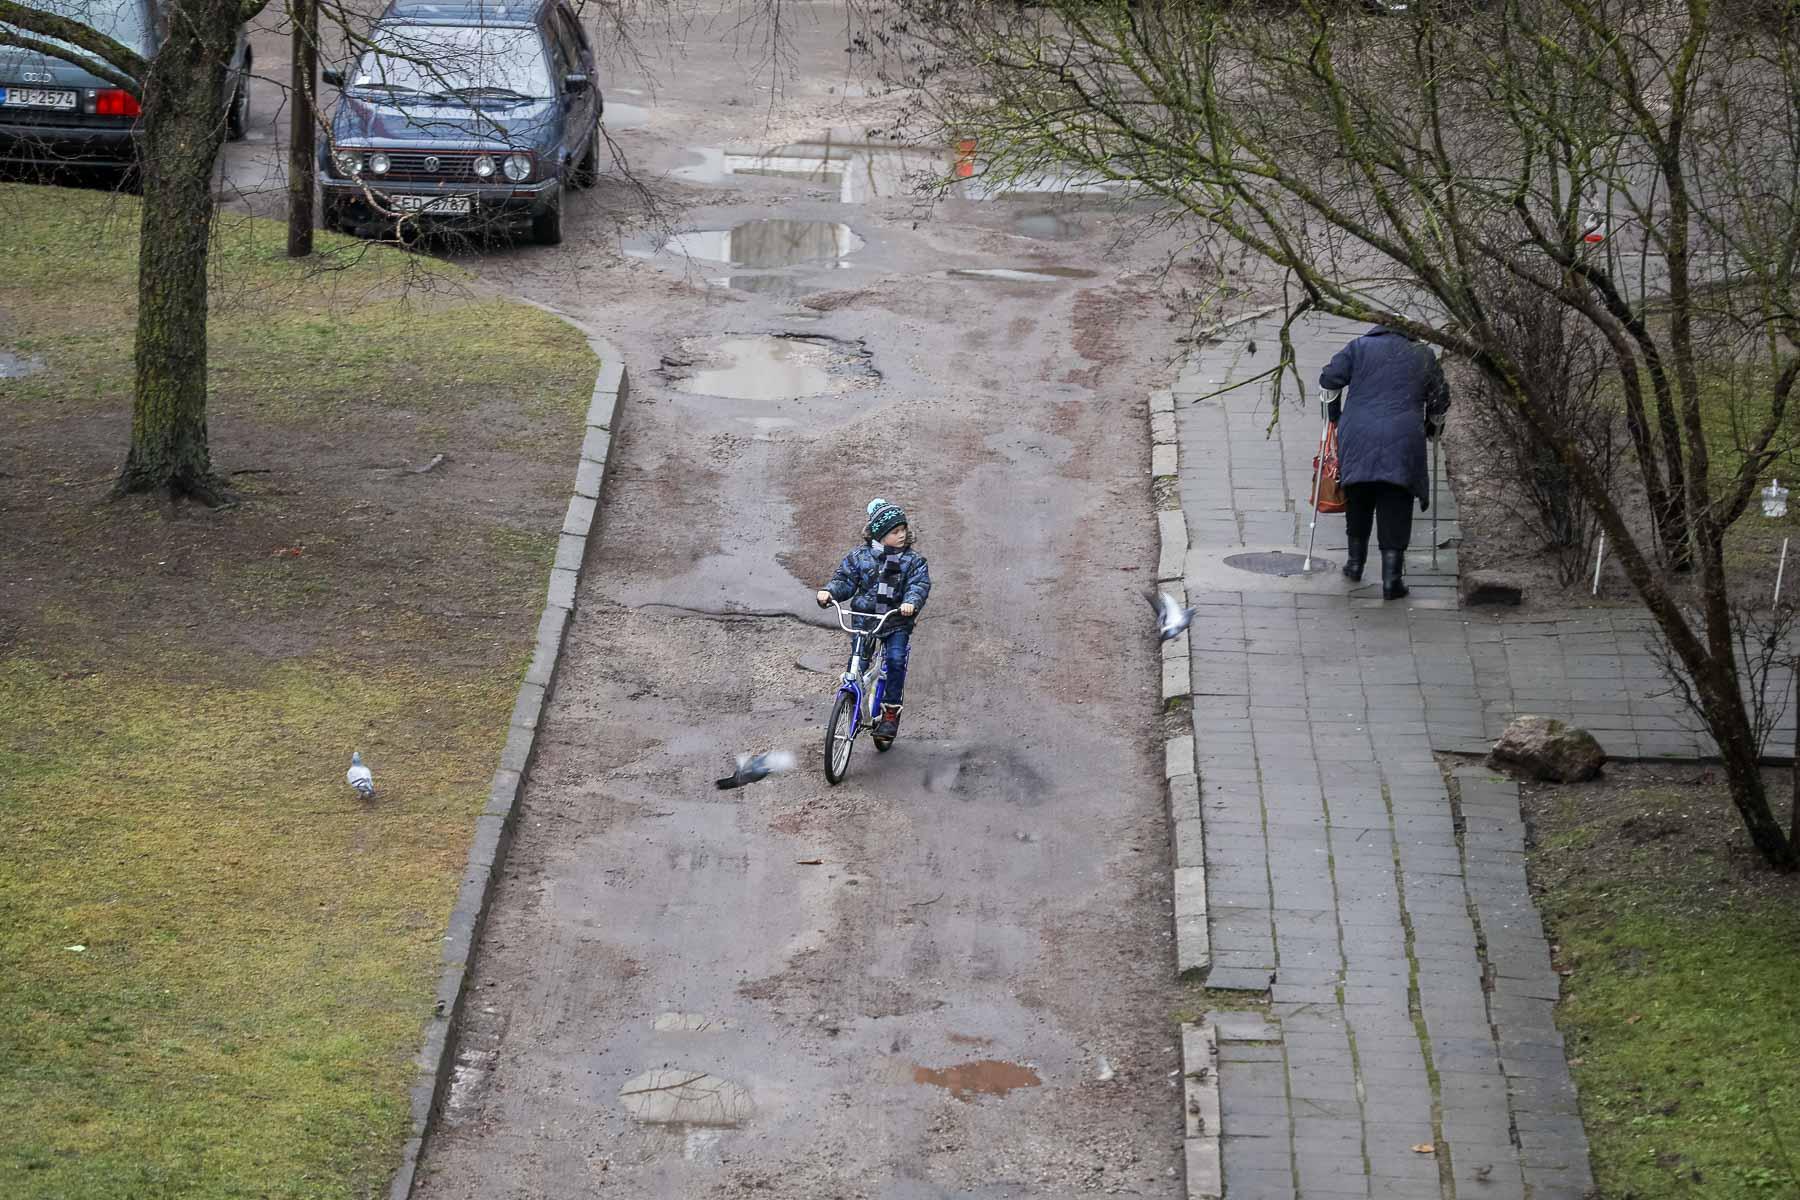 Landscape-cityscape-photography-jelgava-latvia-blocs-blocks-flat-post-soviet--Советские-квартиры-спальный-район-Латвия-город-фотограф-natalia-smith-photography-0058.jpg